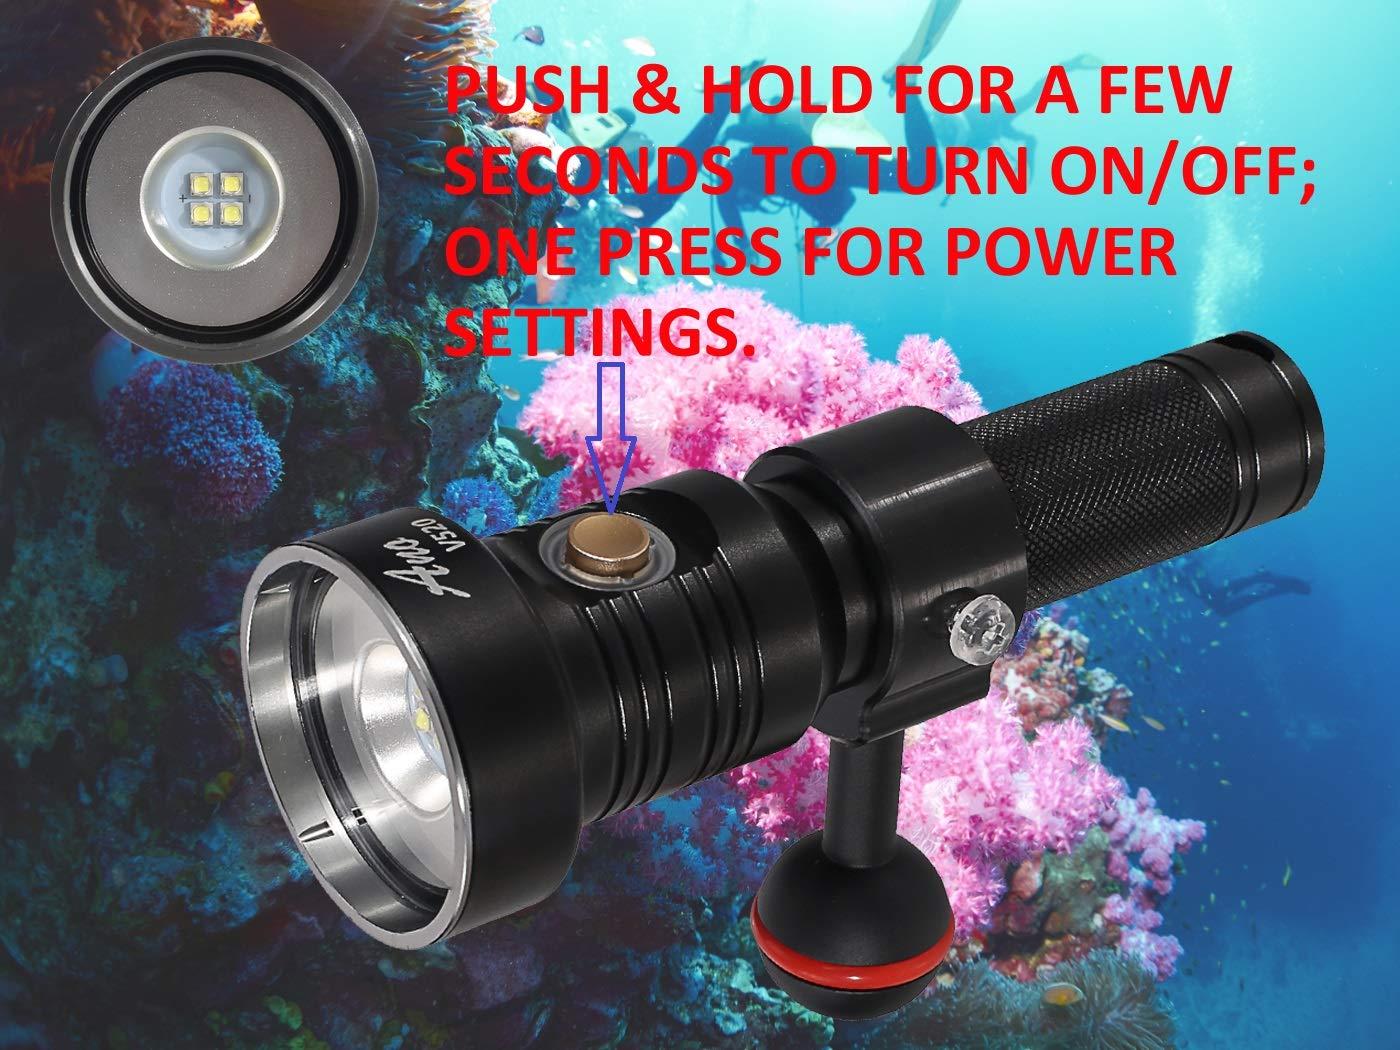 Ano V520 ダイビングビデオライト 2000ルーメン スキューバ 水中撮影ライト 防水 650フィート/200メートル 高CRI リチウムイオンICR18650バッテリー付属   B07P53VMK2